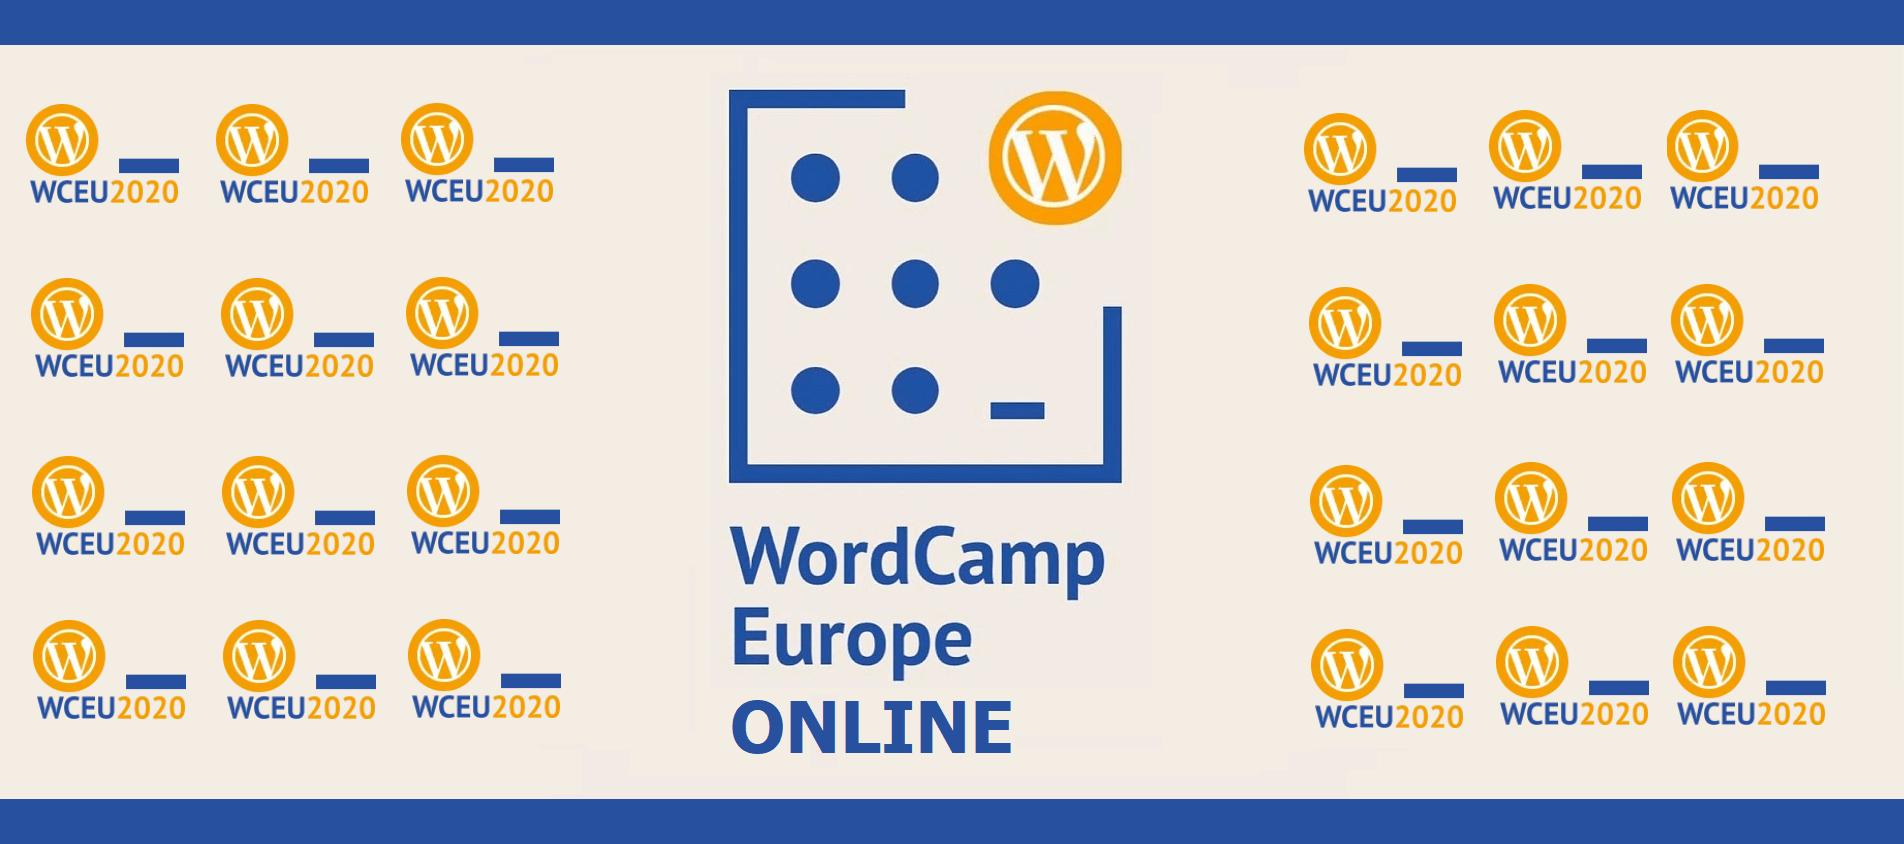 Meet the New Online WordCamp Europe 2020